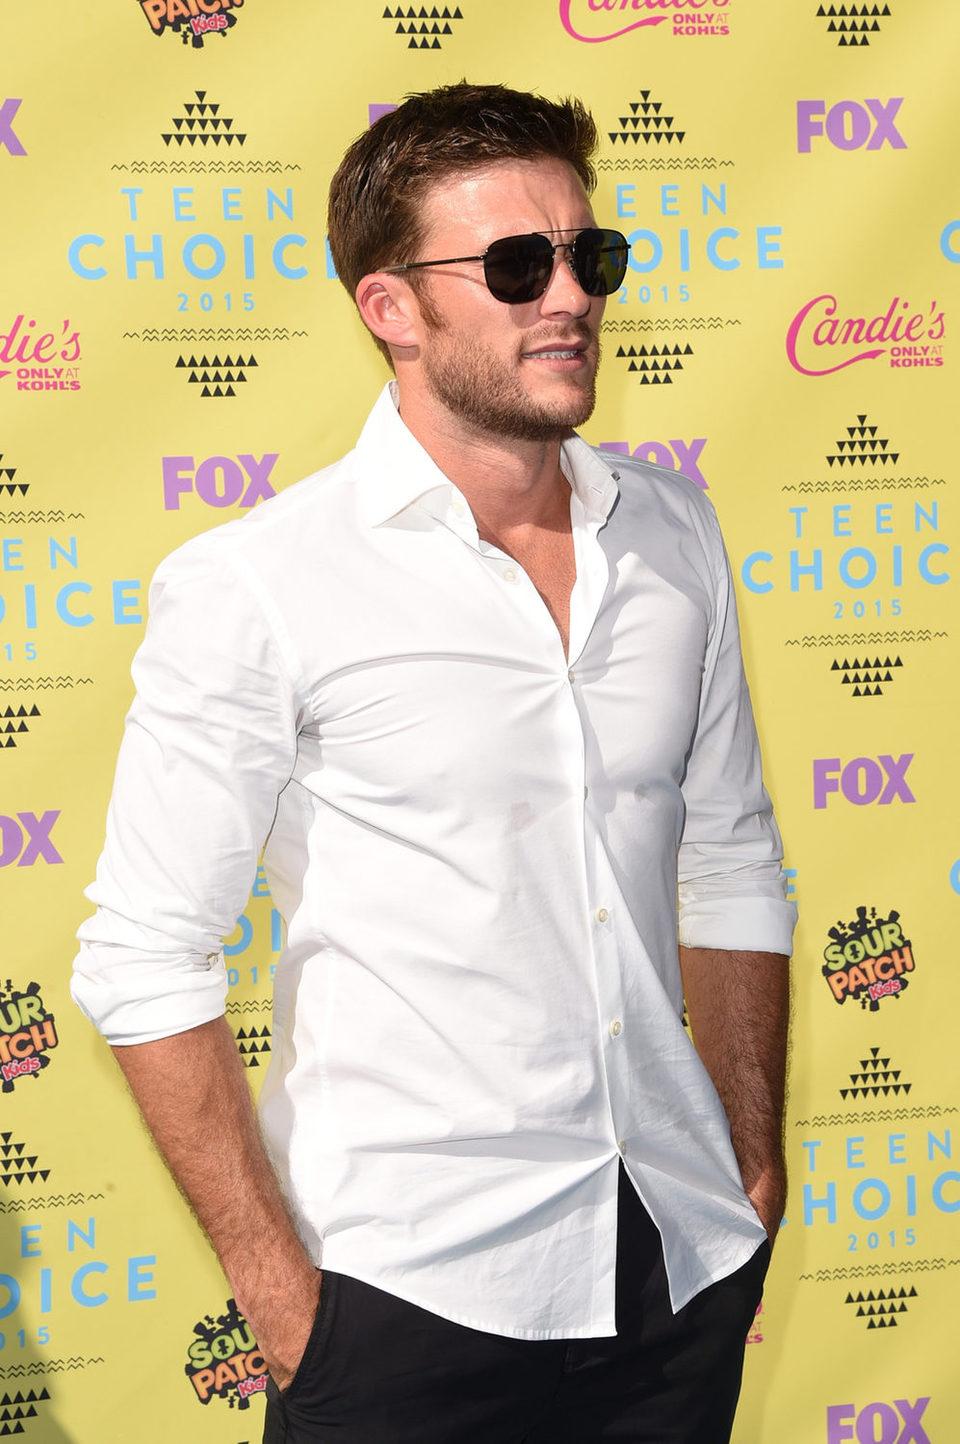 El actor Scott Eastwood en la alfombra roja de los Teen Choice Awards 2015